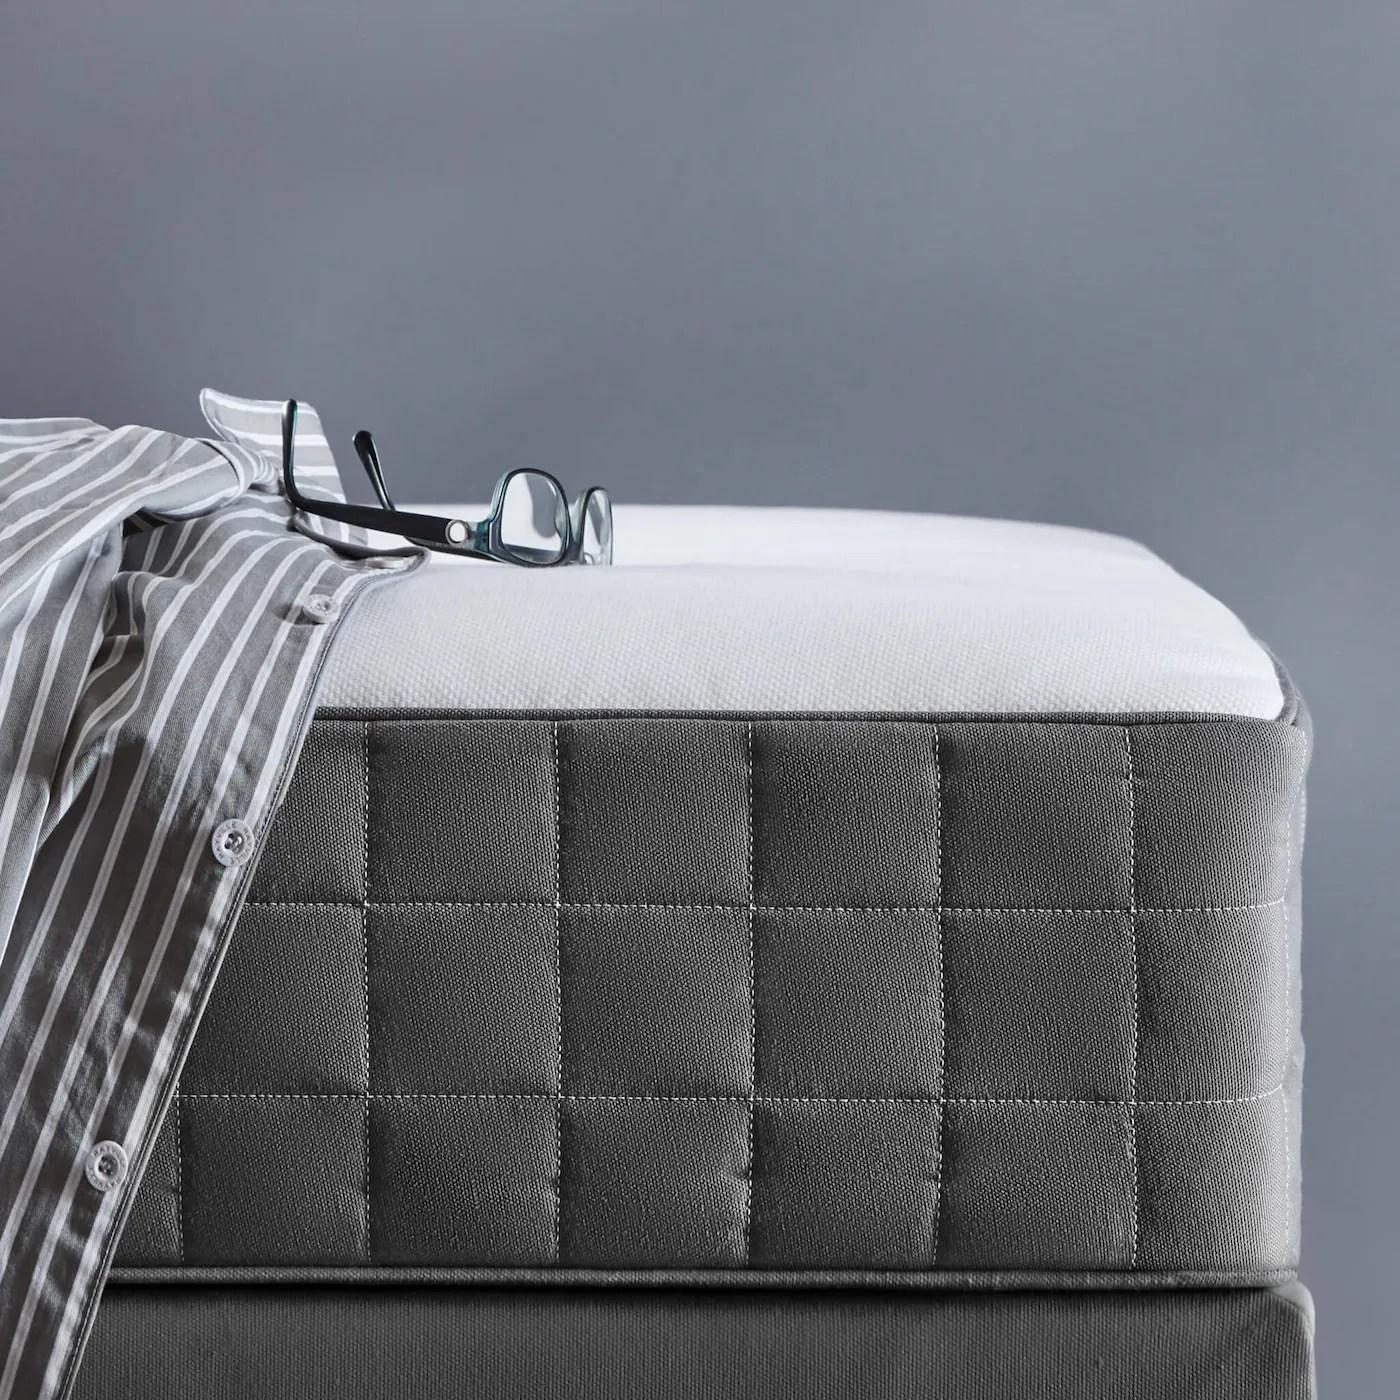 Ikea Family Offers Furniture And Home Furnishings Ikea